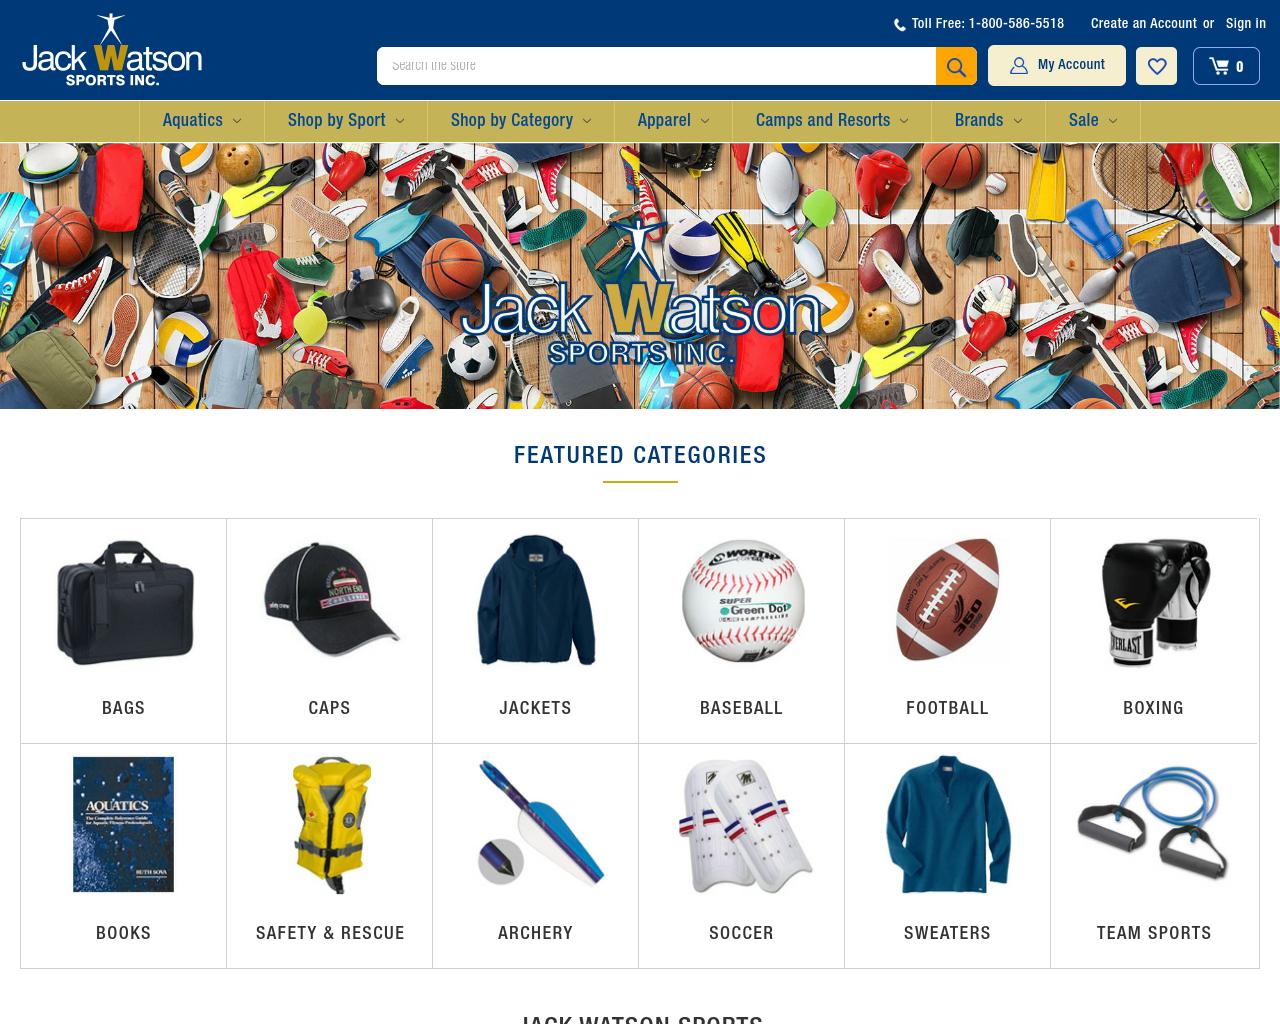 Jack-Watson-Sports-Inc.-Advertising-Reviews-Pricing